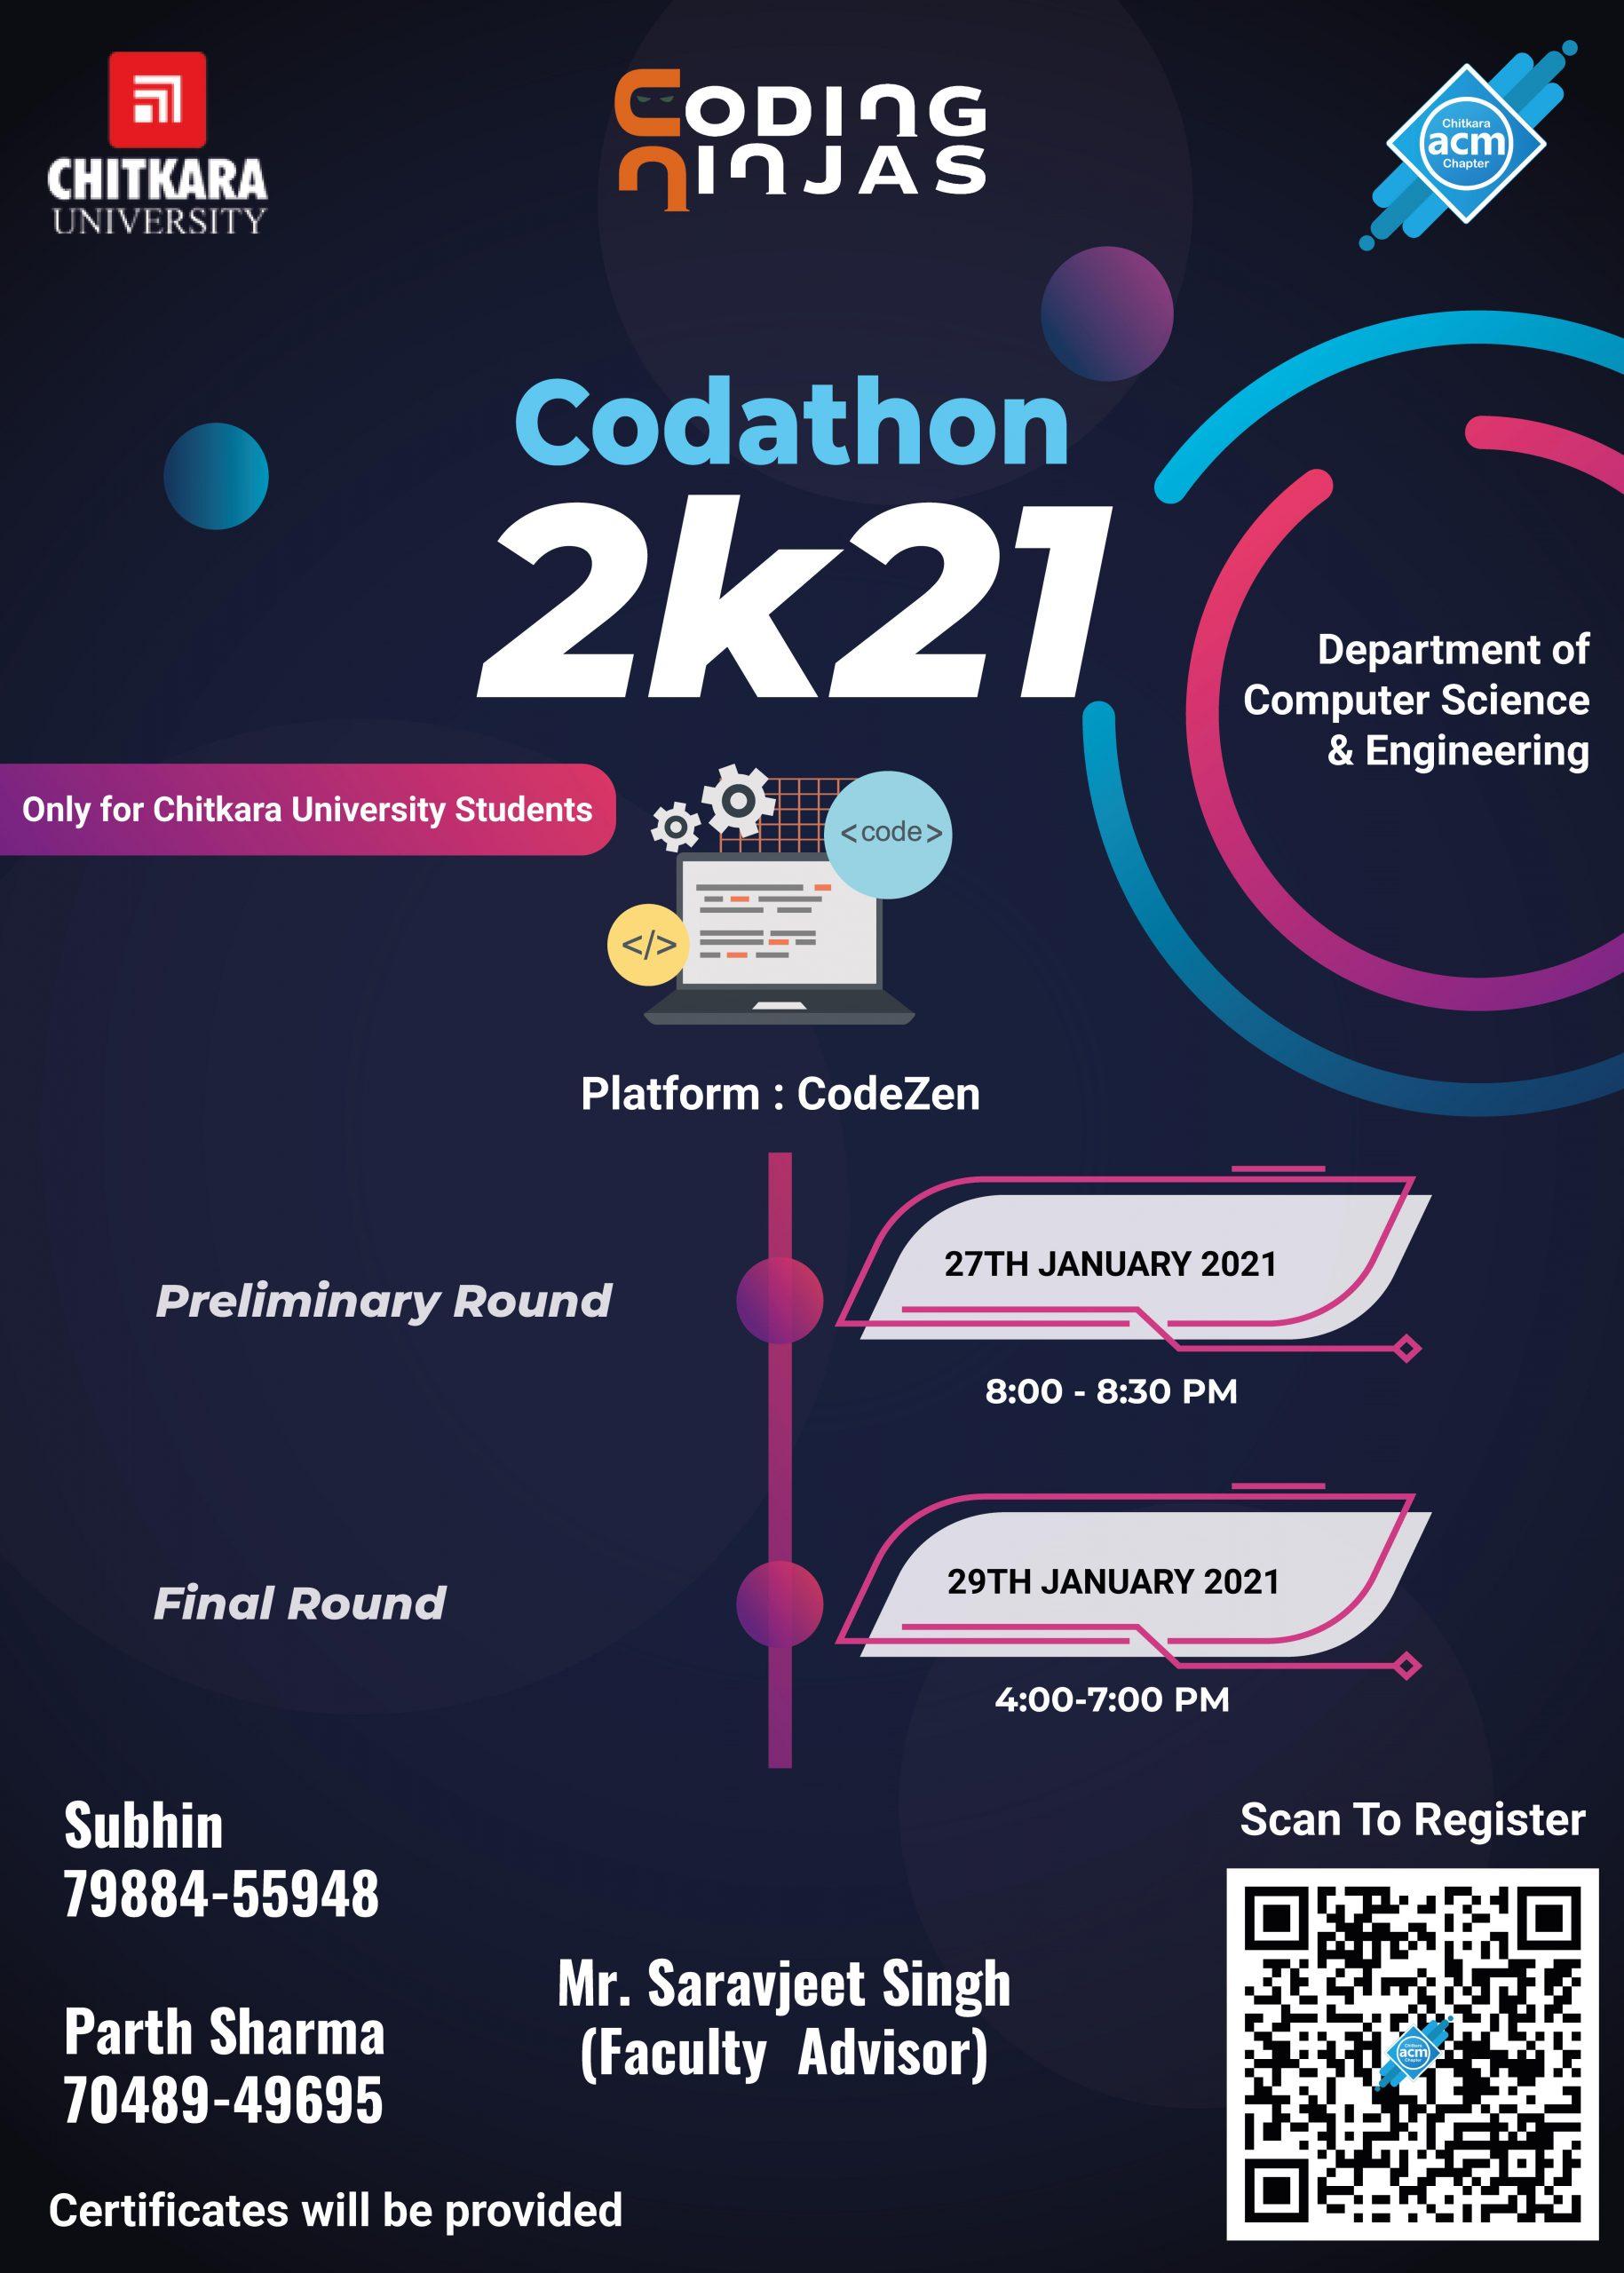 acm_event_codathon